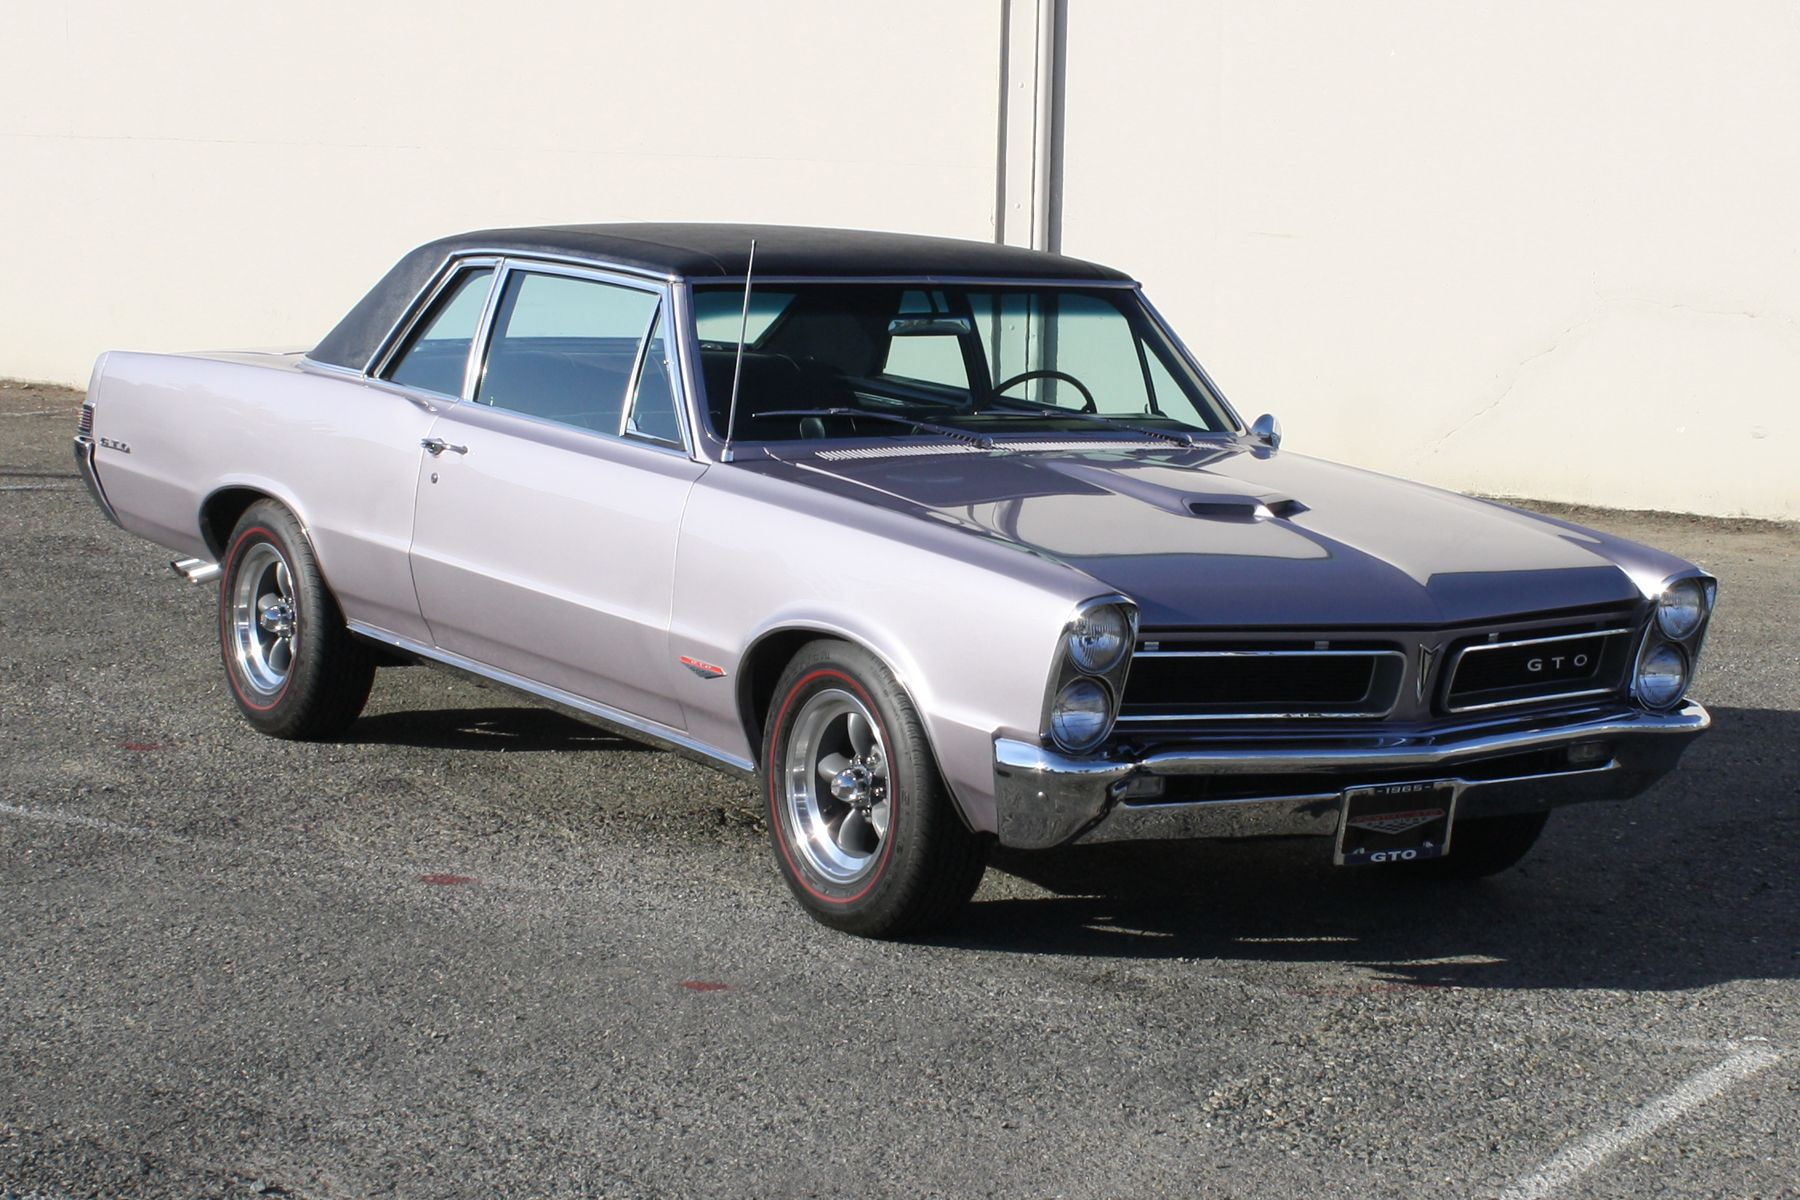 Northern California Gto Club Gto Pontiac Gto 1965 Gto